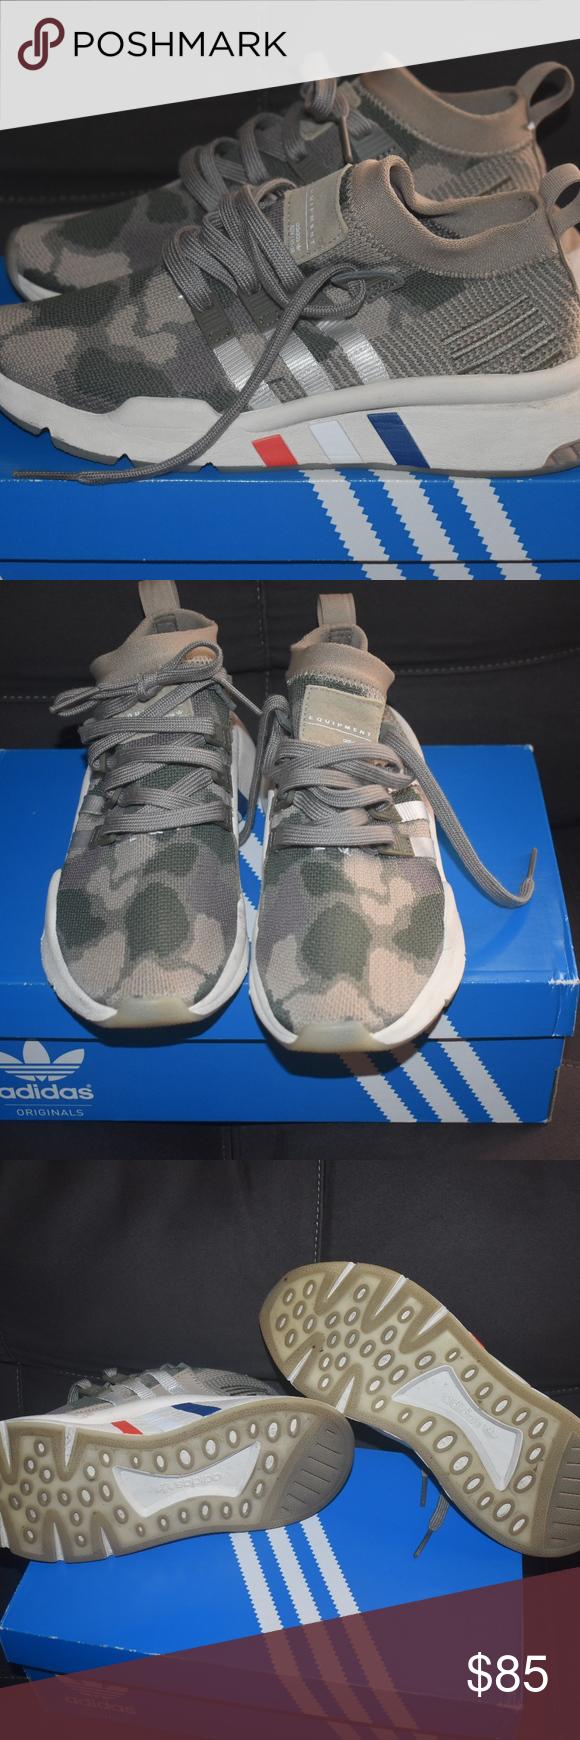 Adidas EQT Support Mid Adv | Adidas eqt, Adidas, Shoes sneakers adidas